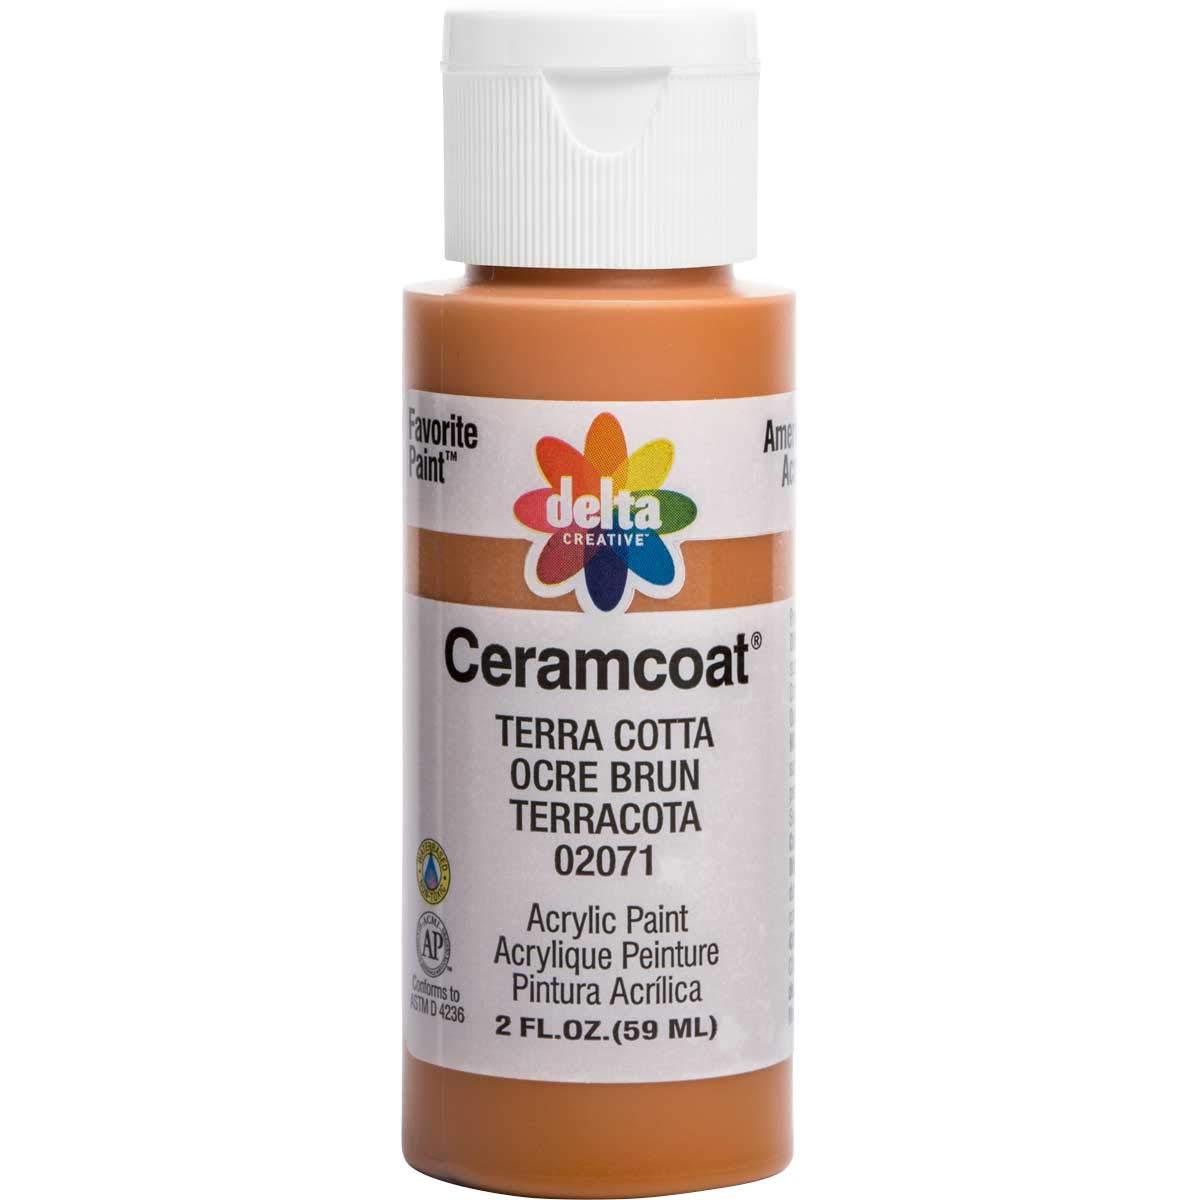 Delta Creative Ceramcoat Acrylic Paint in Assorted Colors (2 oz), 2071, Terra Cotta